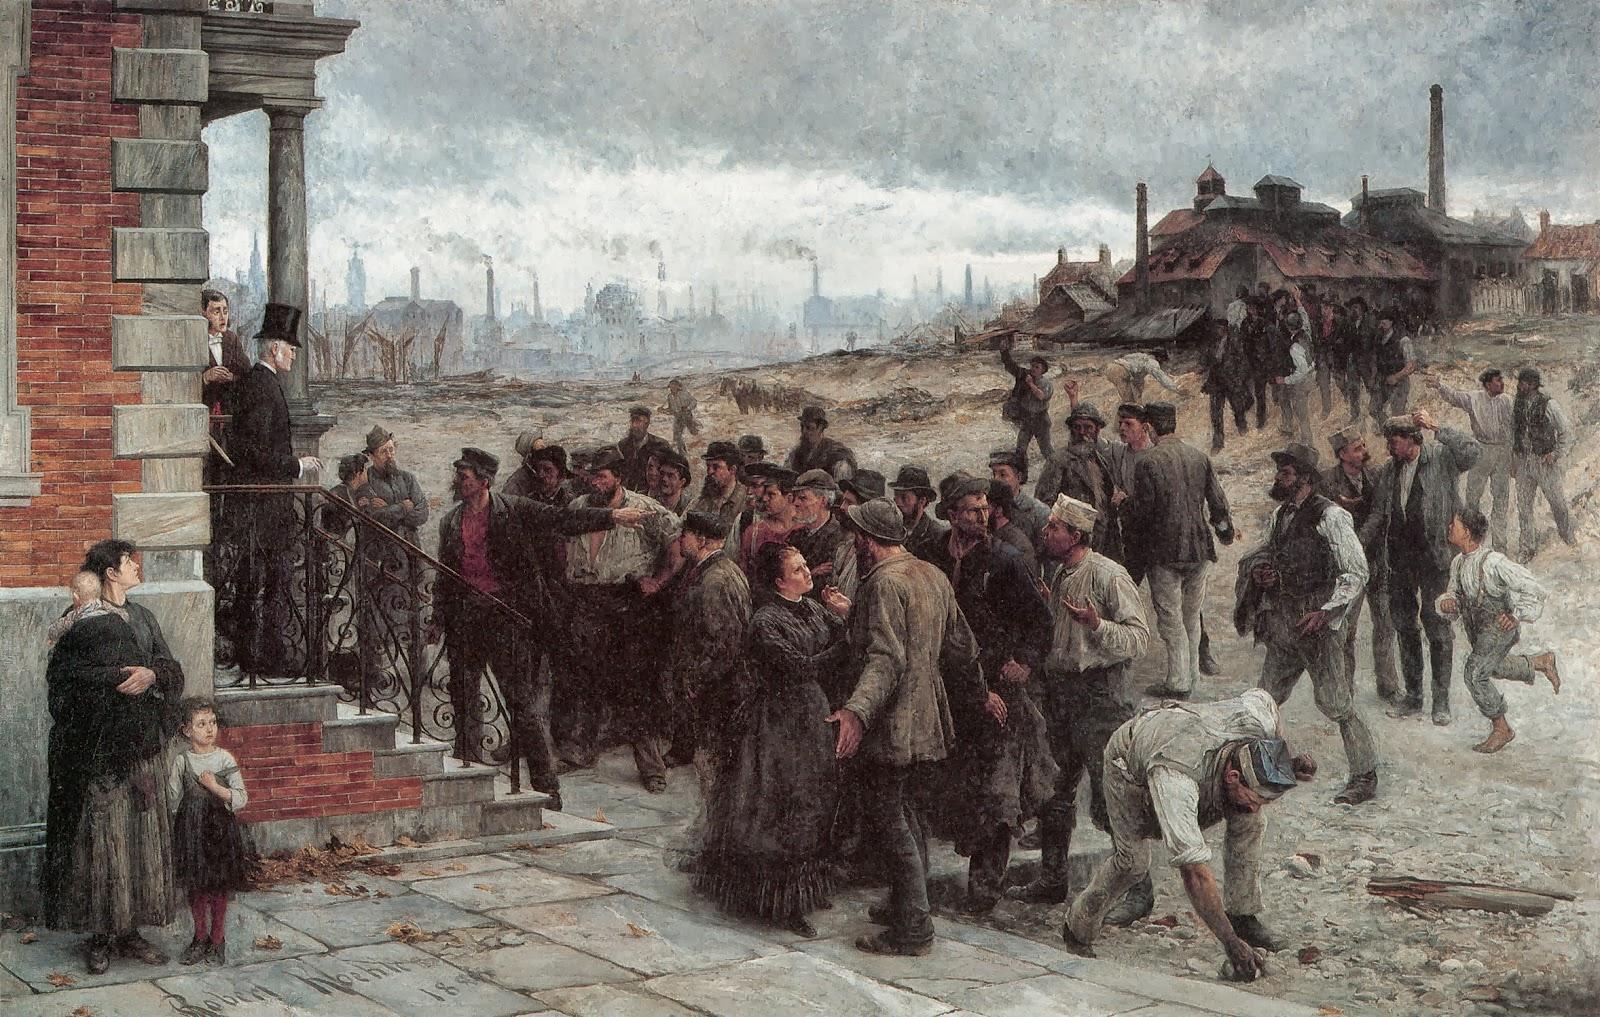 Robert Koehler. La vaga, 1866.